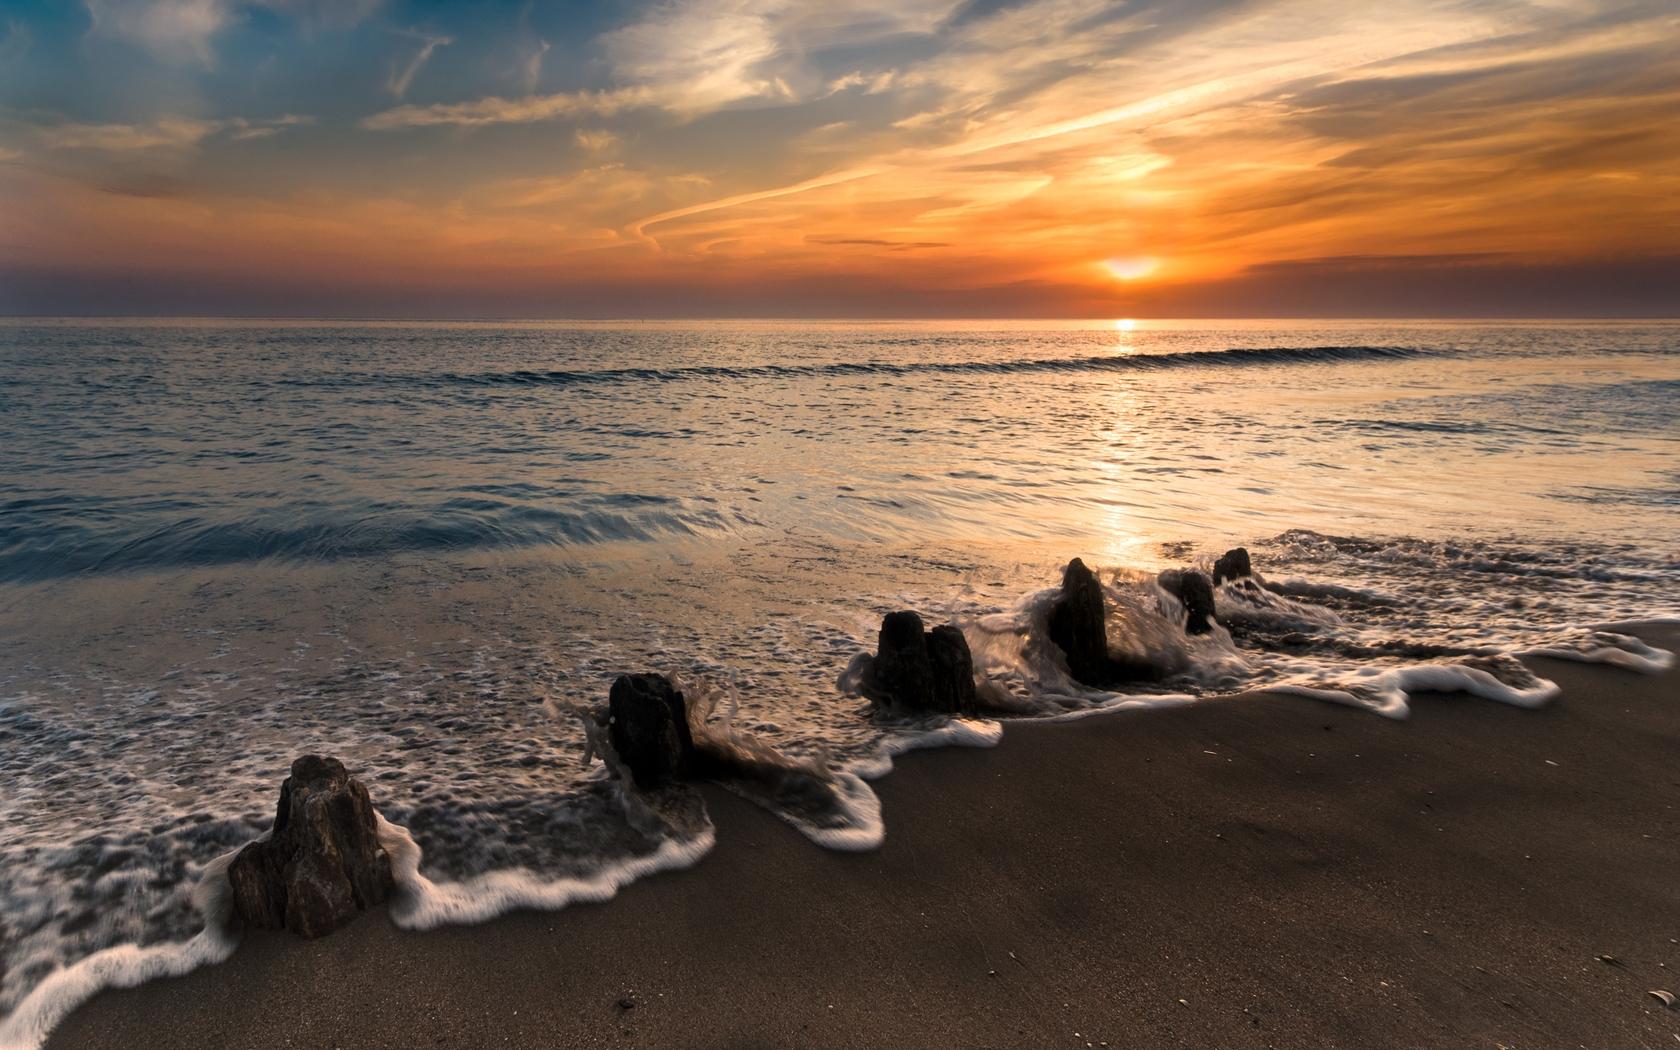 картинки день на берегу моря зыбин тренде флеш-тату цитатами